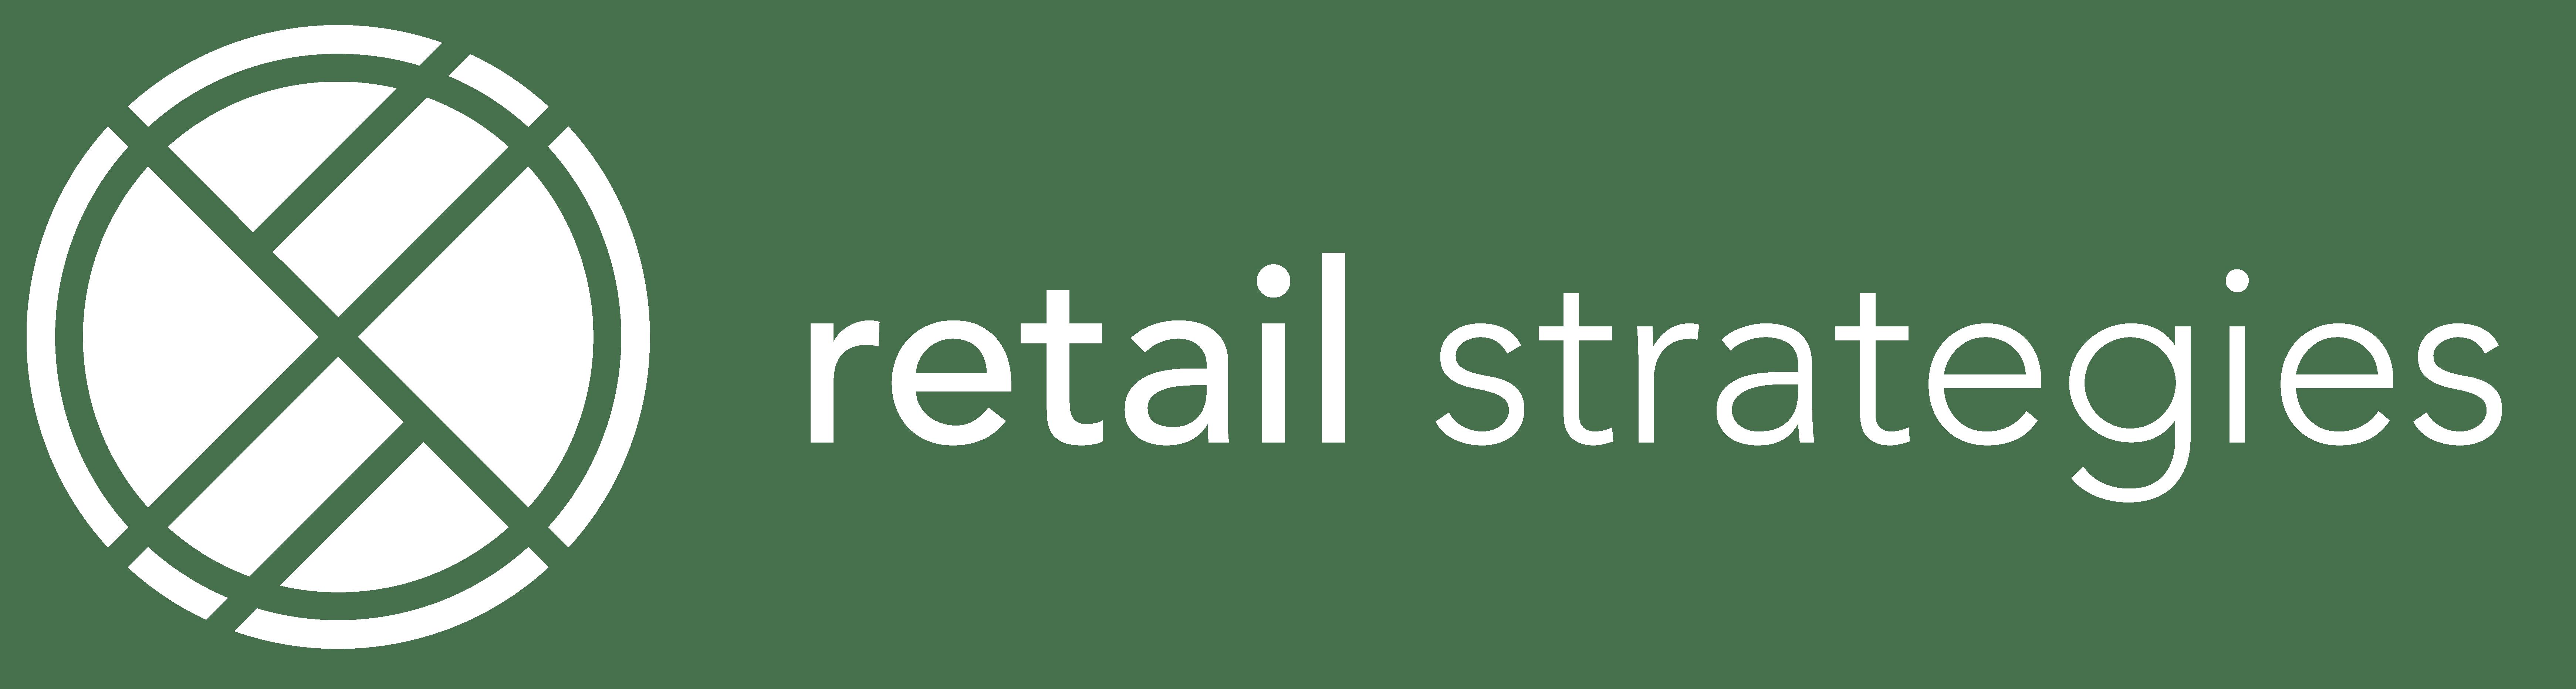 Retail Strategies Shop